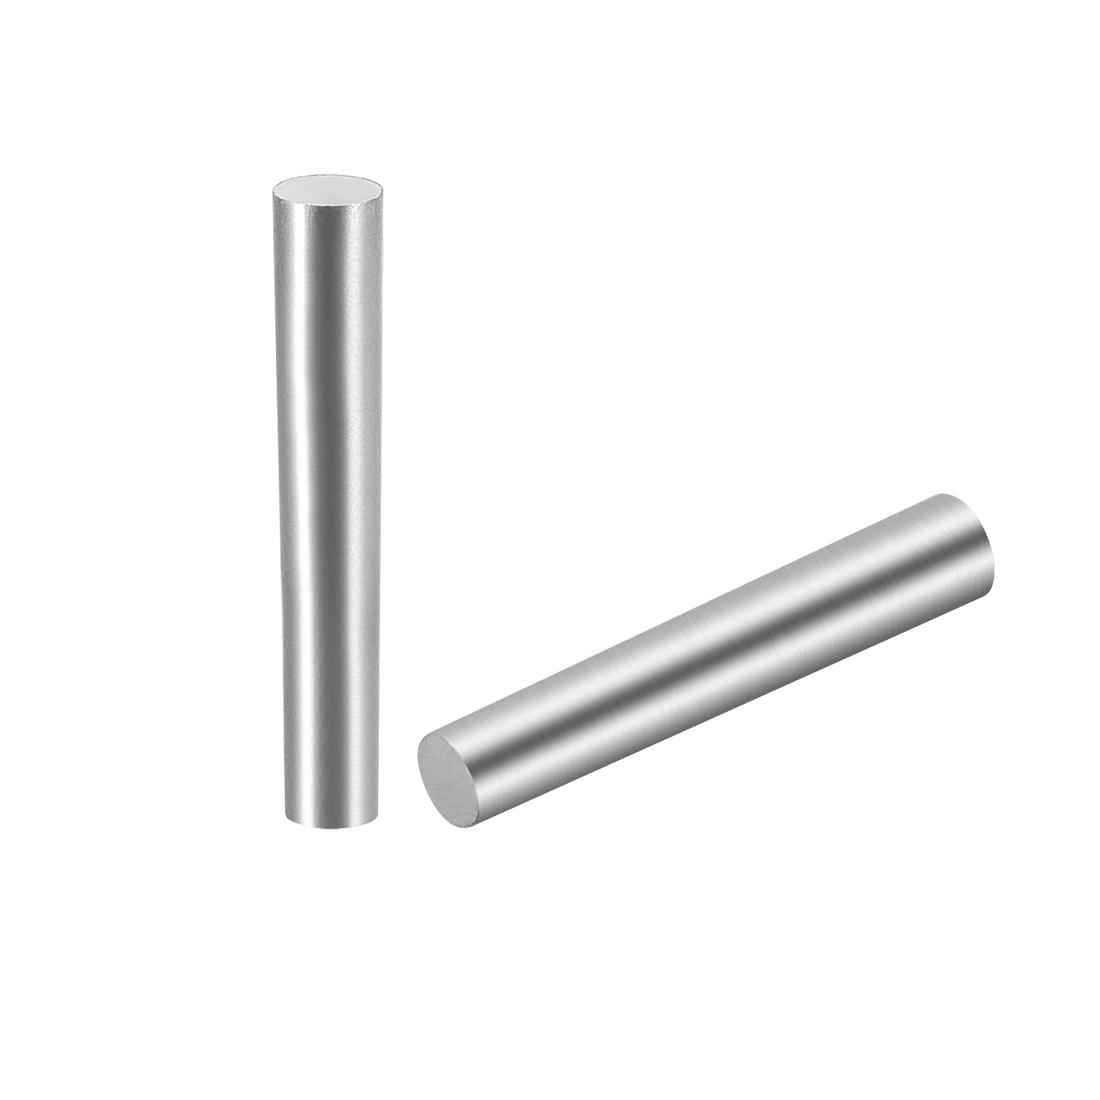 2Pcs 4mm x 30mm 1:50 Taper Pin 304 Stainless Steel Shelf Support Pin Fasten